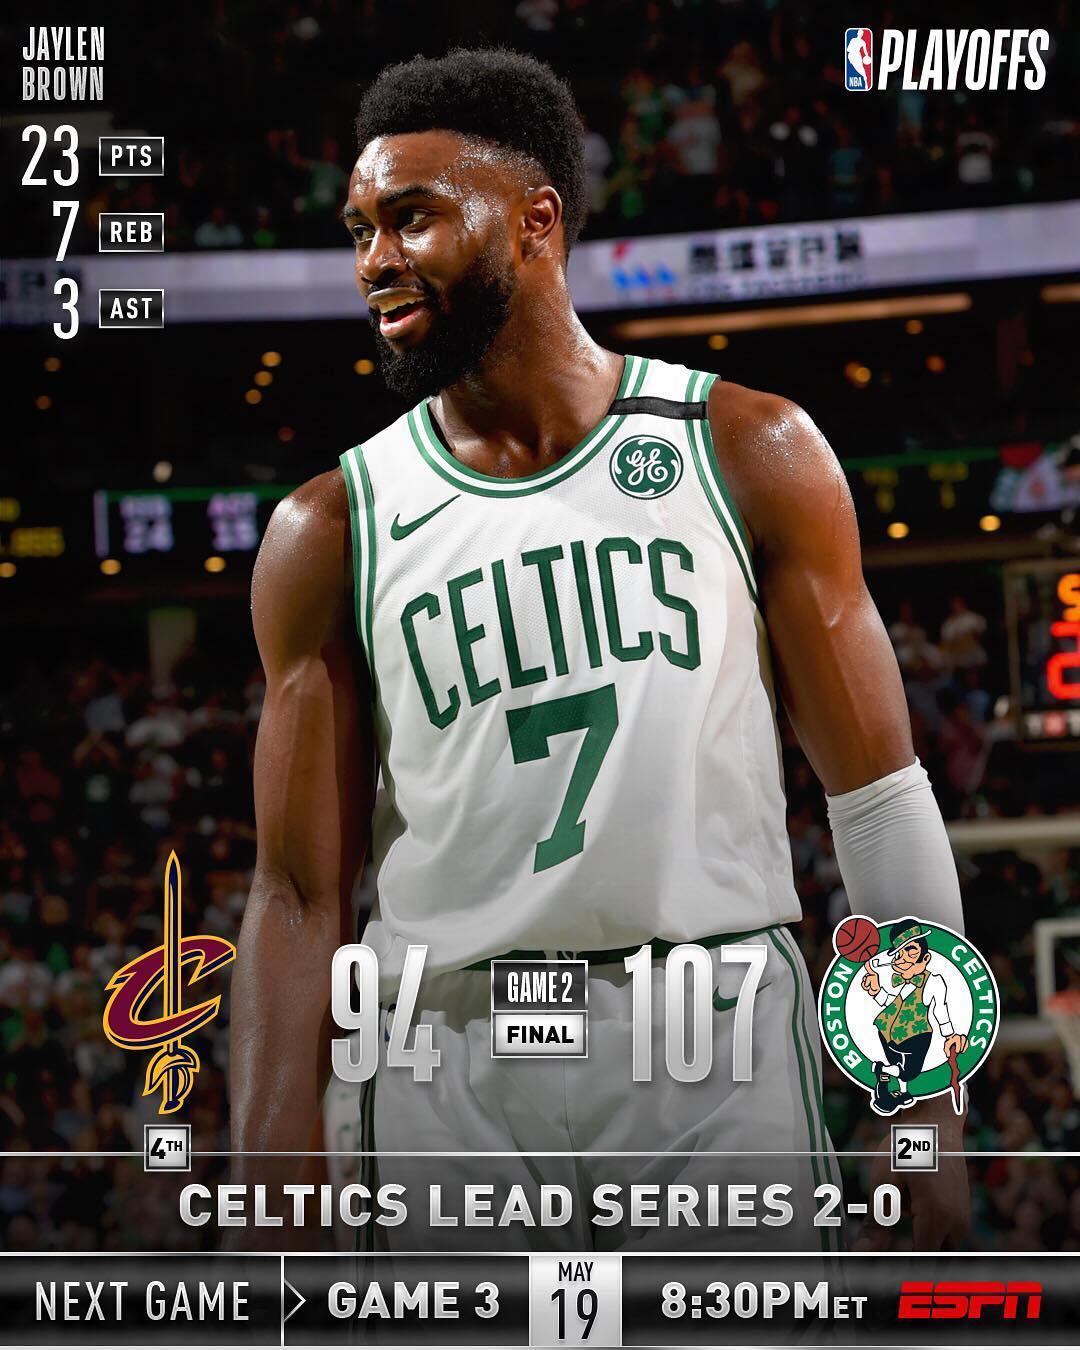 NBA官方发布今日凯尔特人获胜的战报图